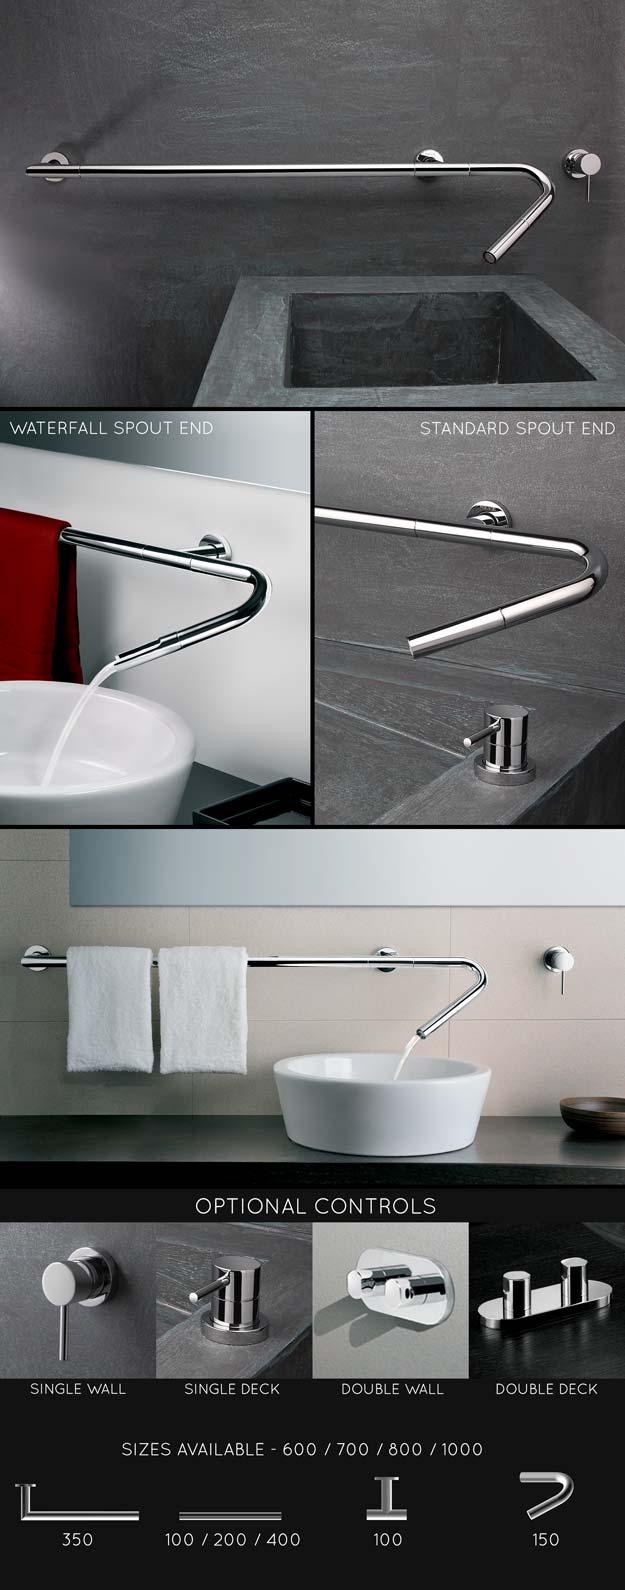 Robinetterie de lavabos design robinetterie d 39 evier for Robinet design salle de bain